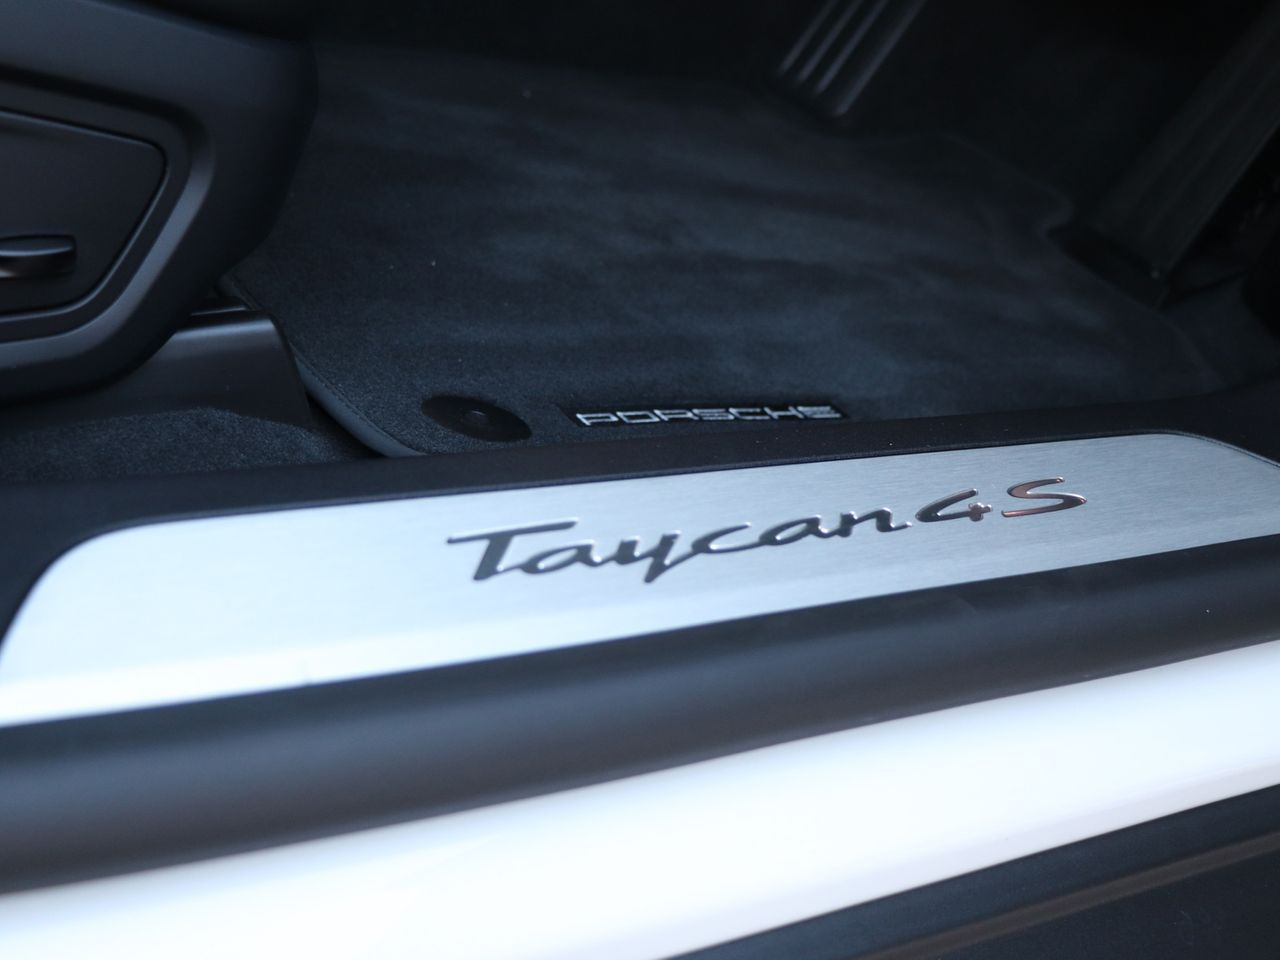 Taycan 4S (93KWH) (4) image 25